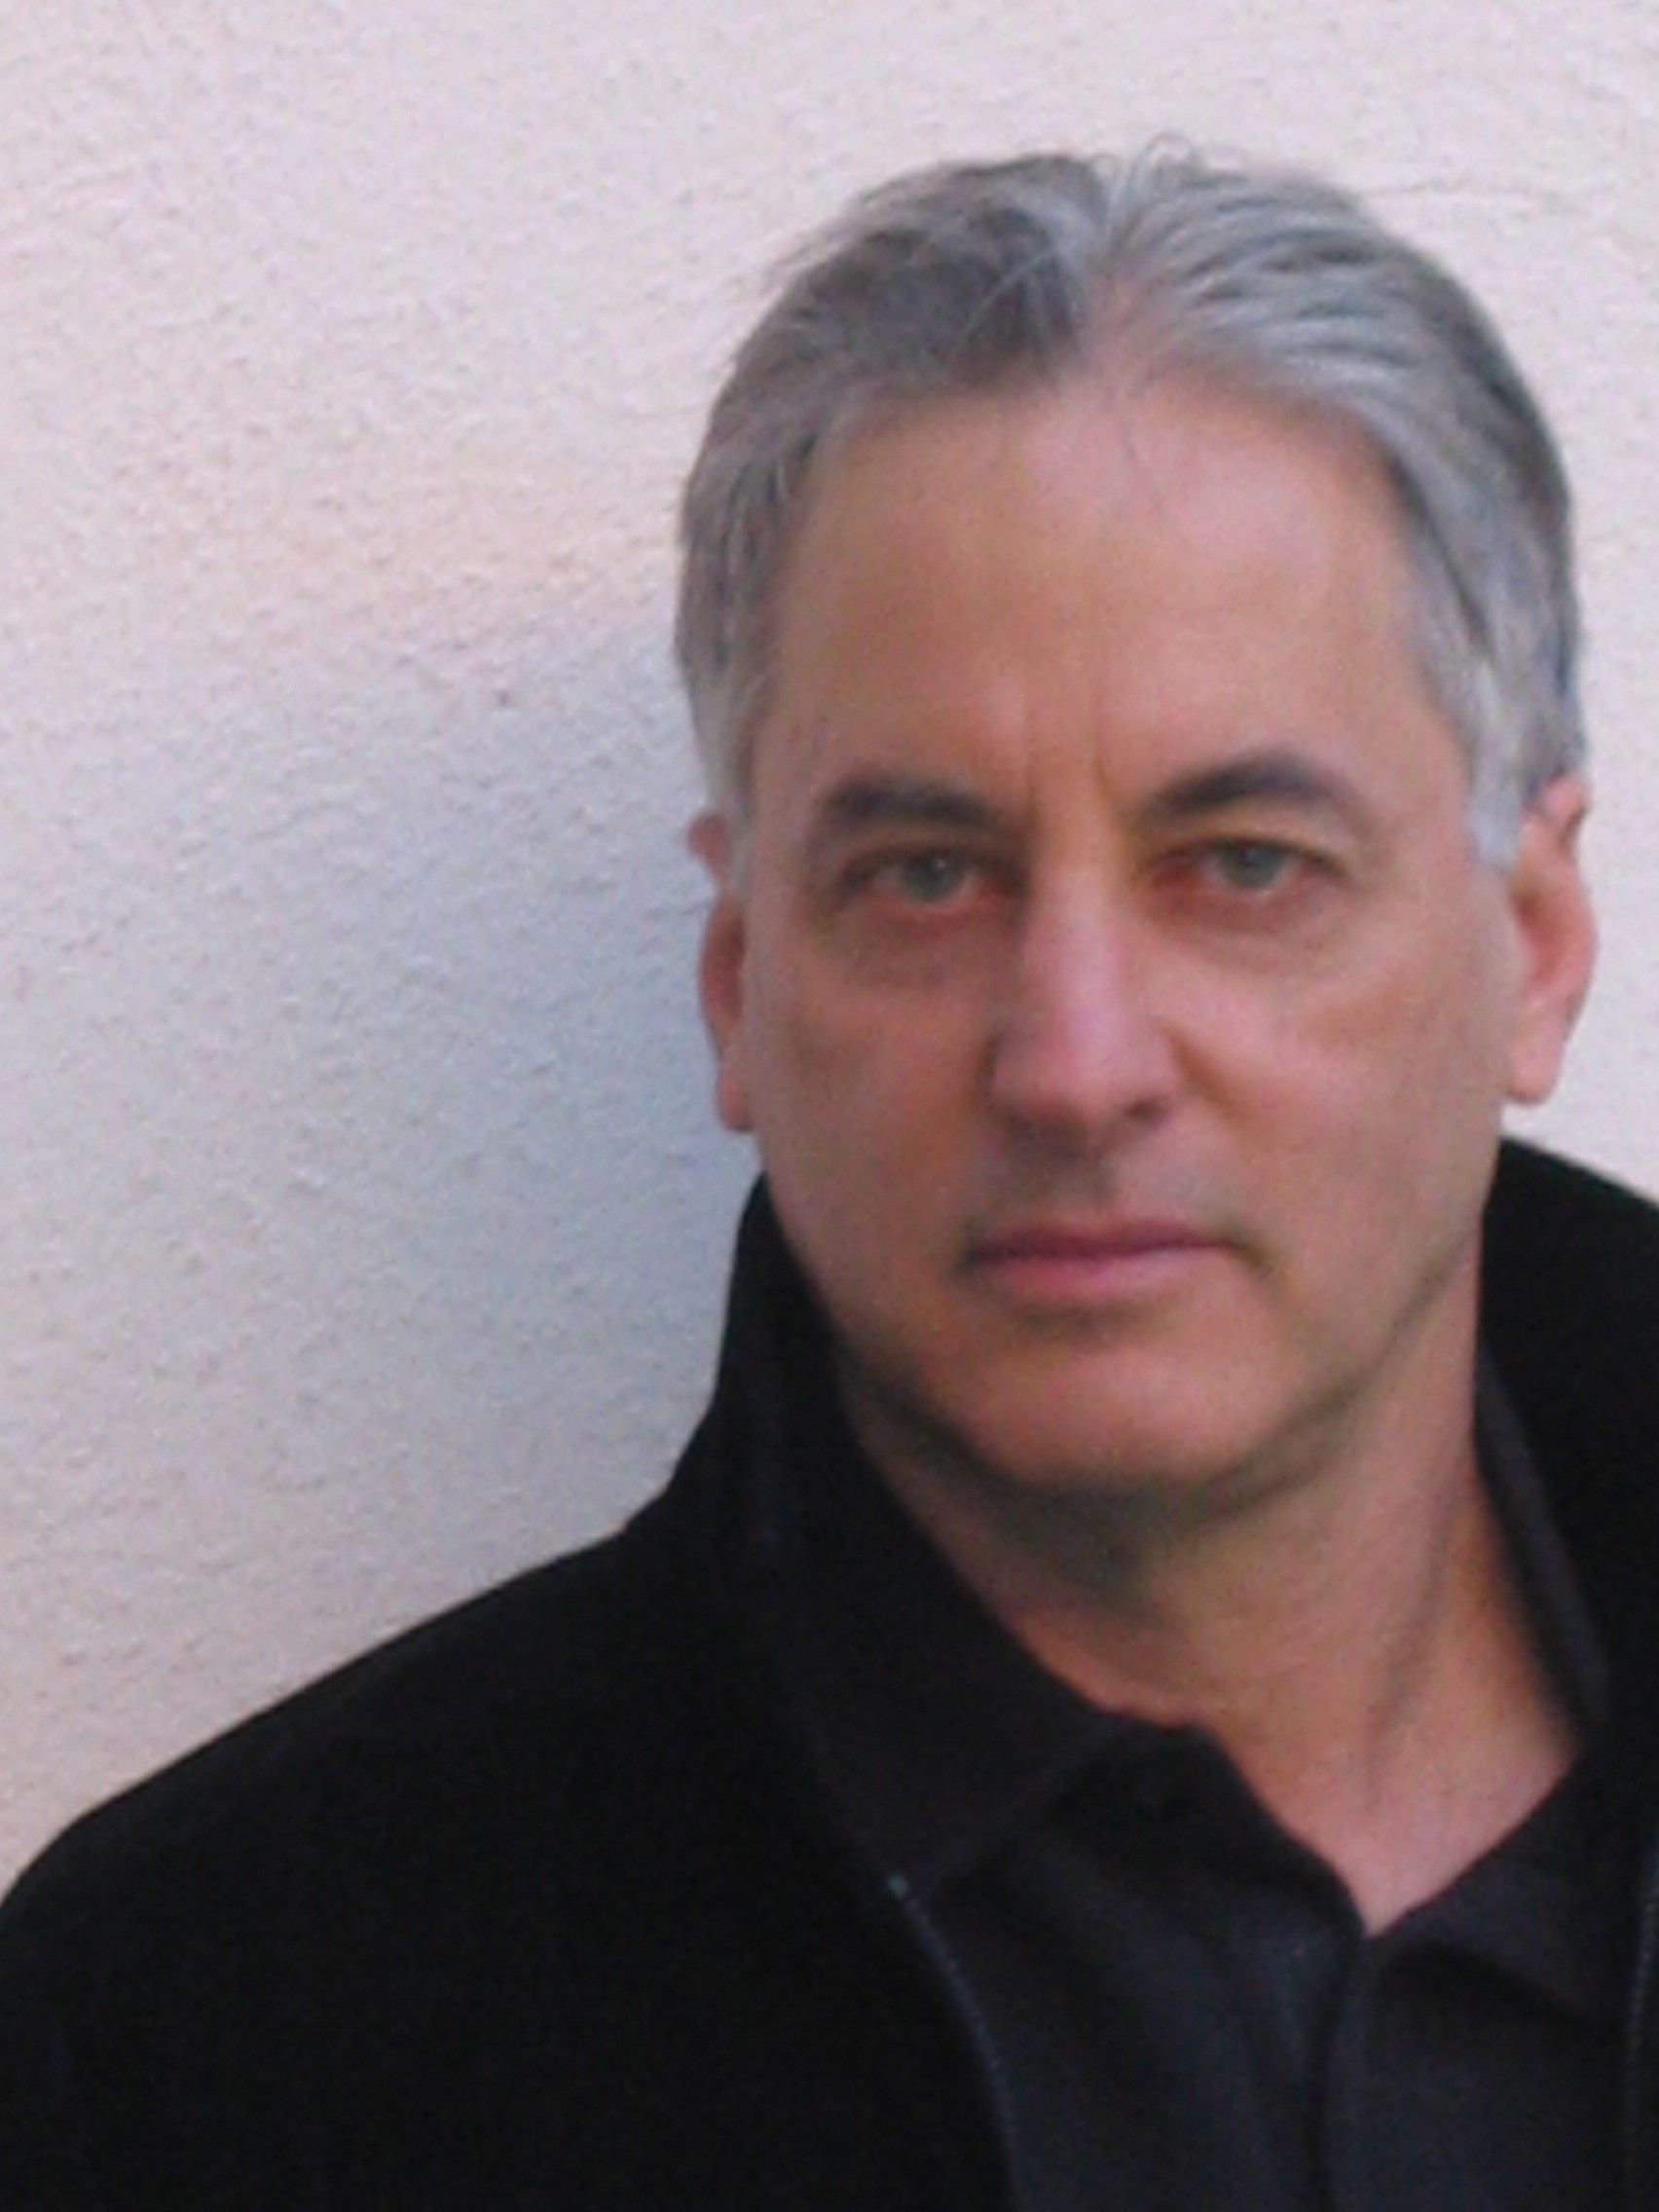 Image of Paul Garson from Wikidata